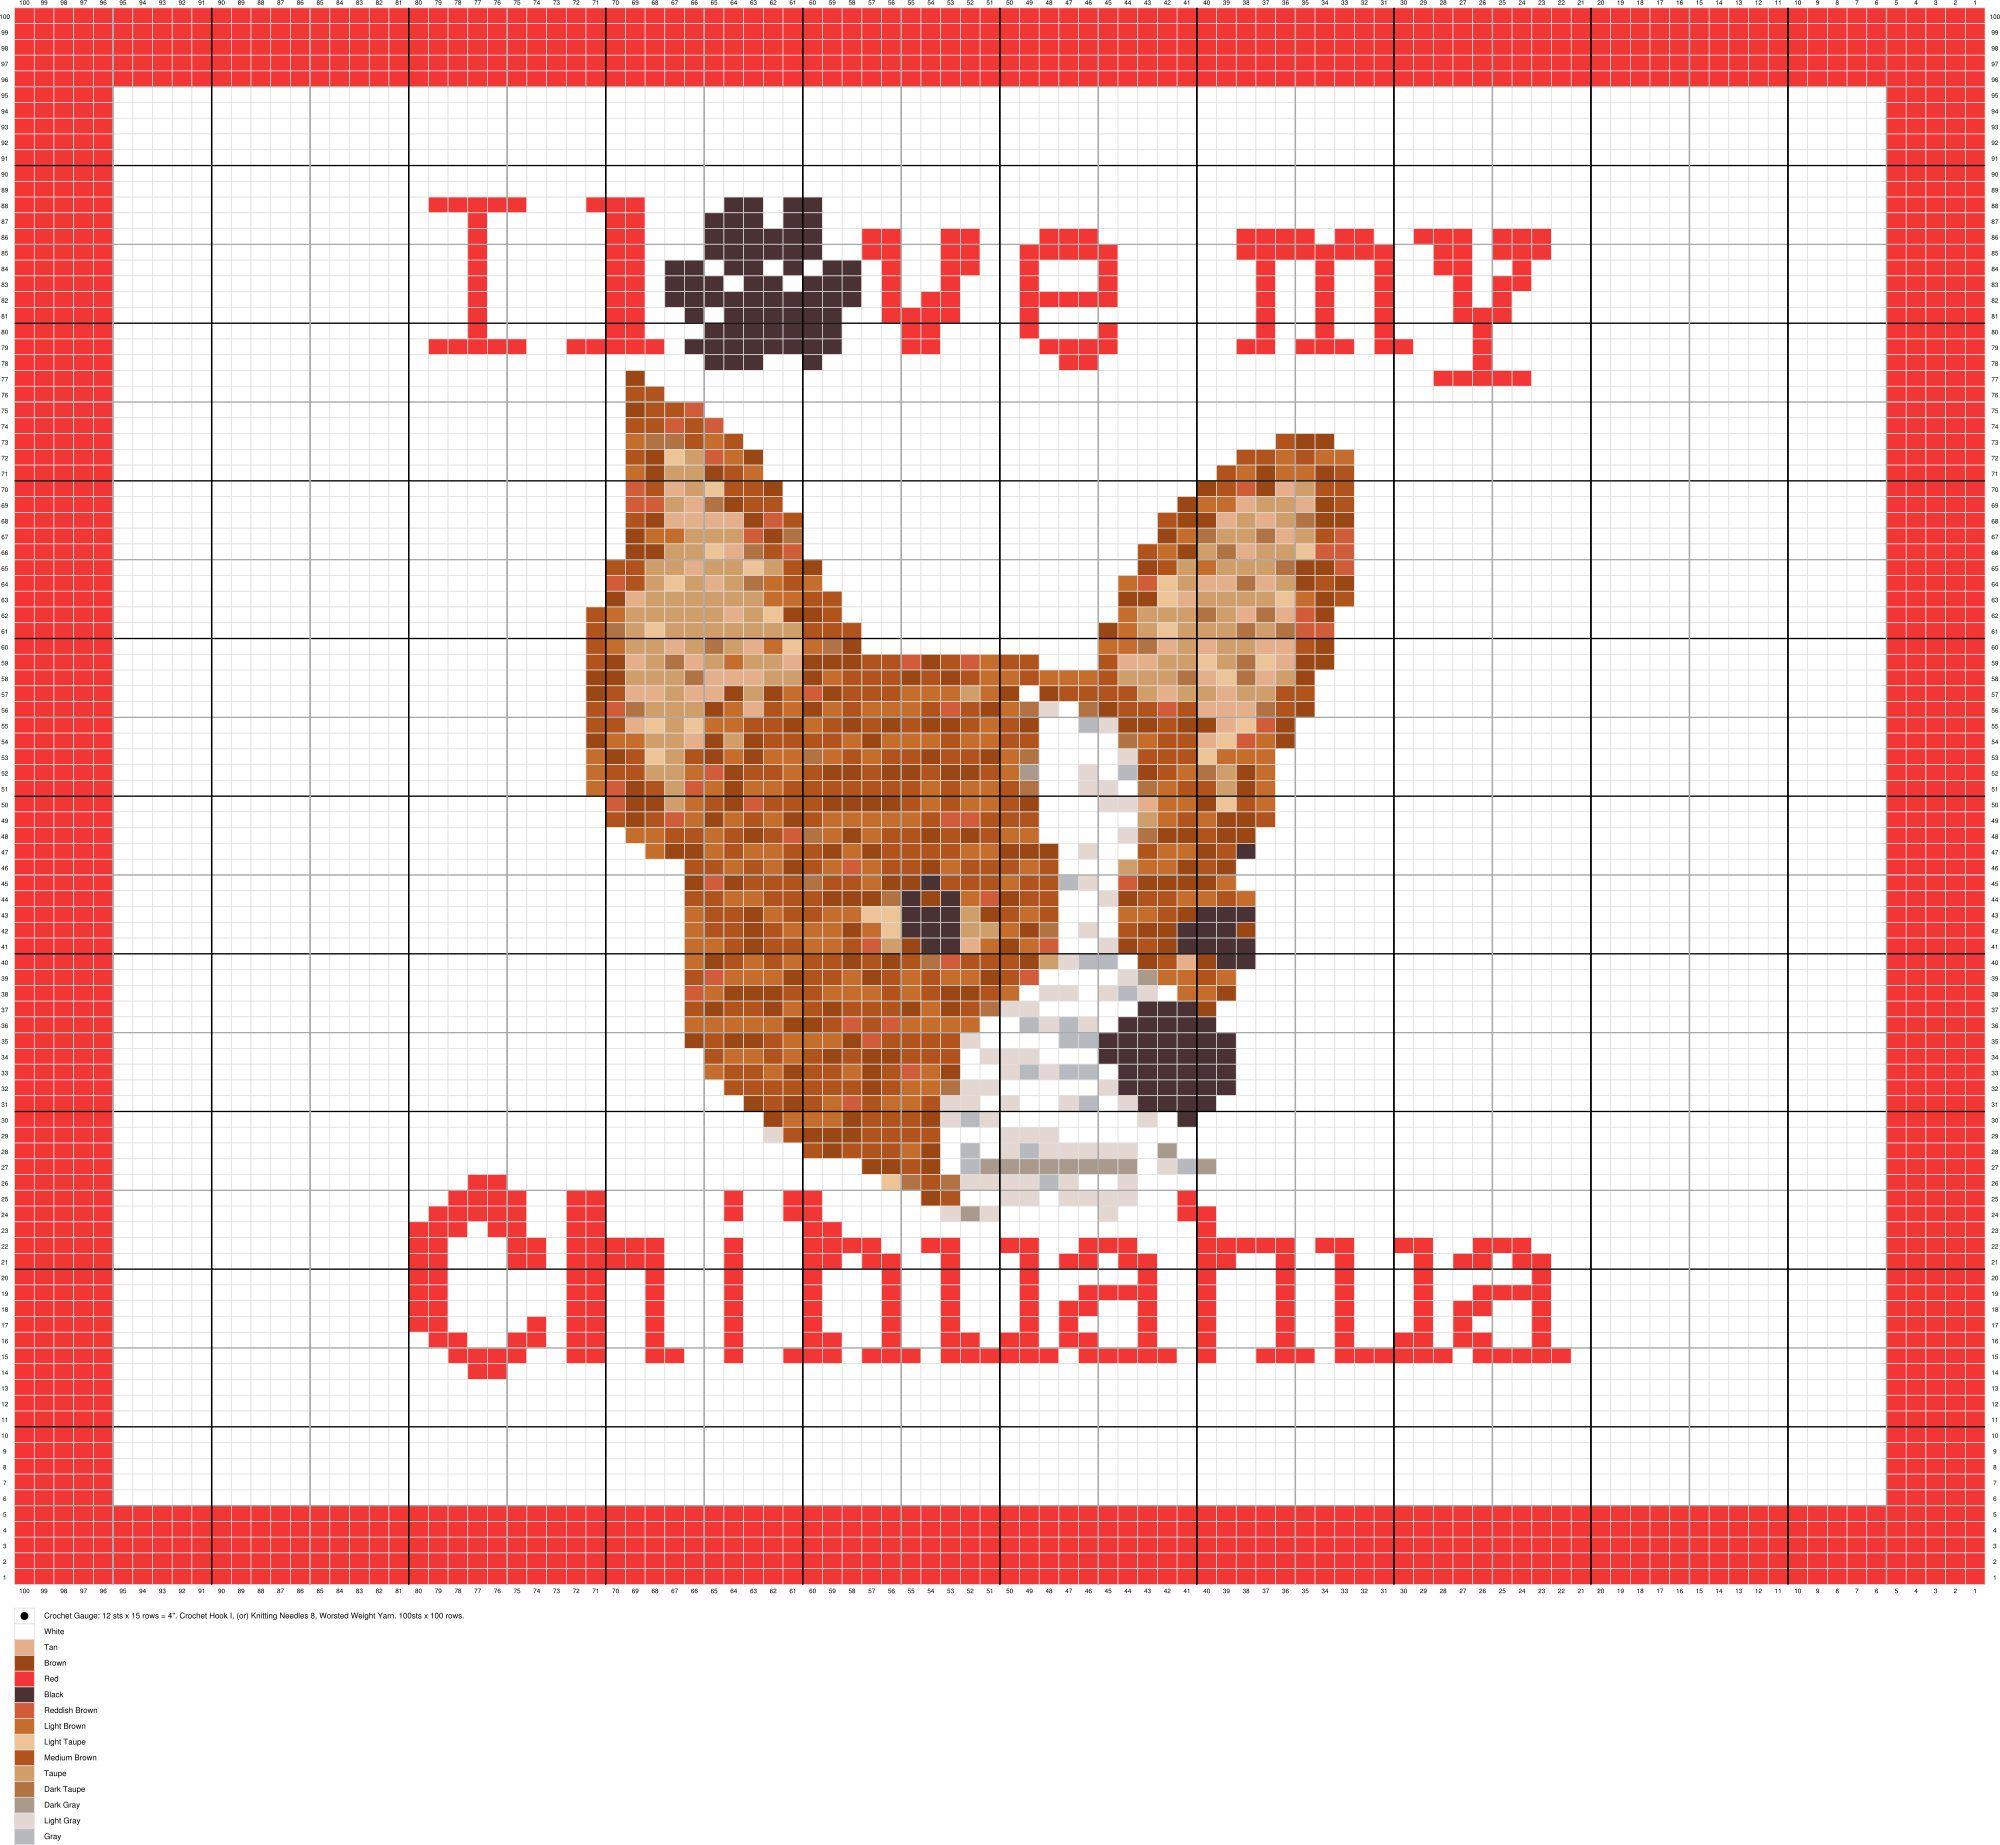 Crochet Patterns CHIHUAHUA Crochet Graph//Chart afghan pattern